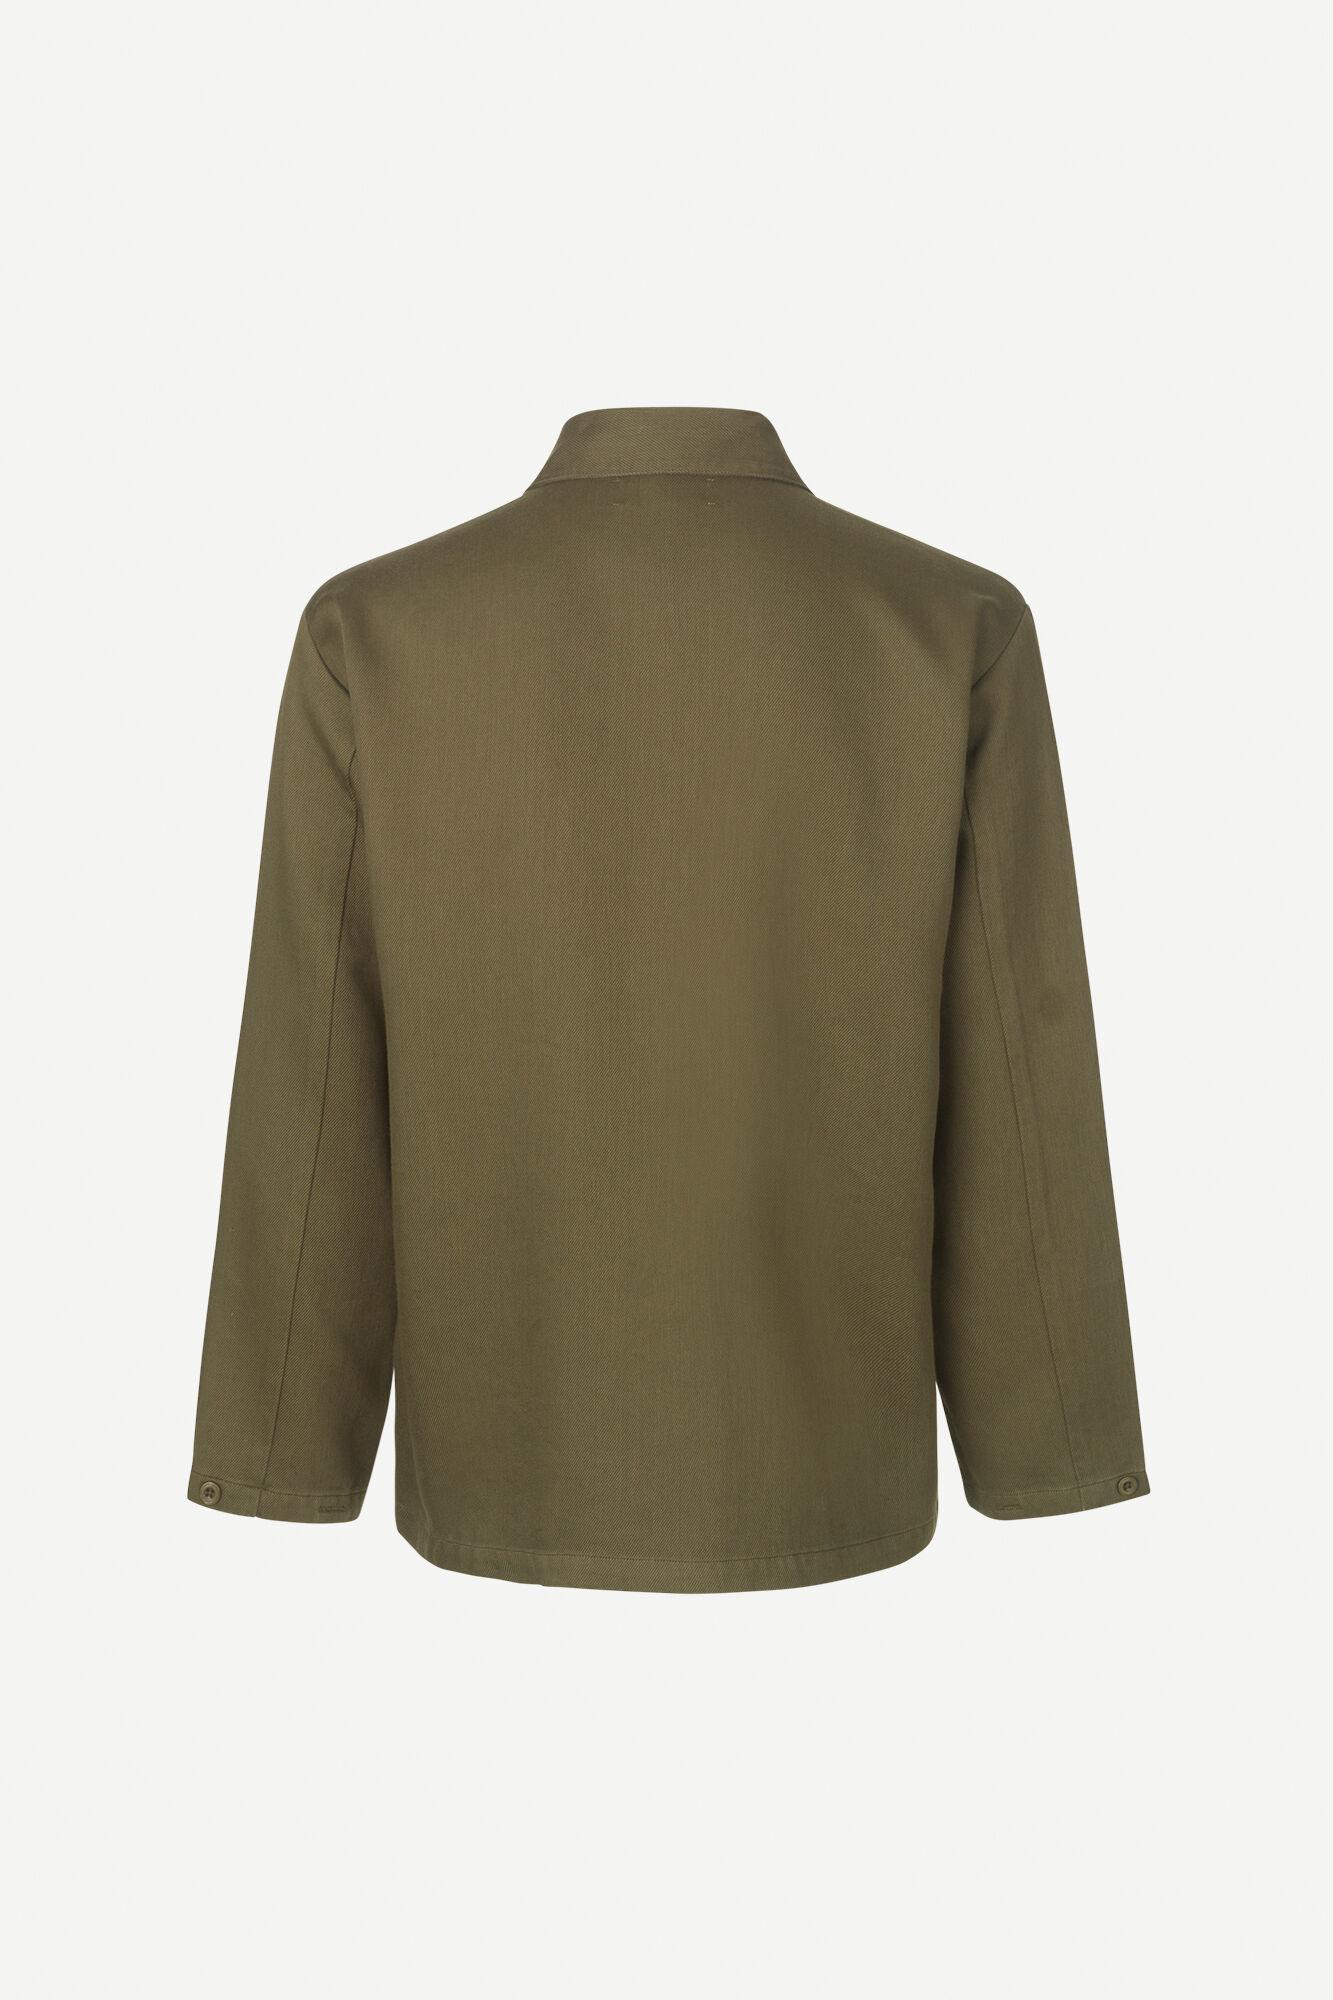 Vega Dark Olive Overshirt 12804-3